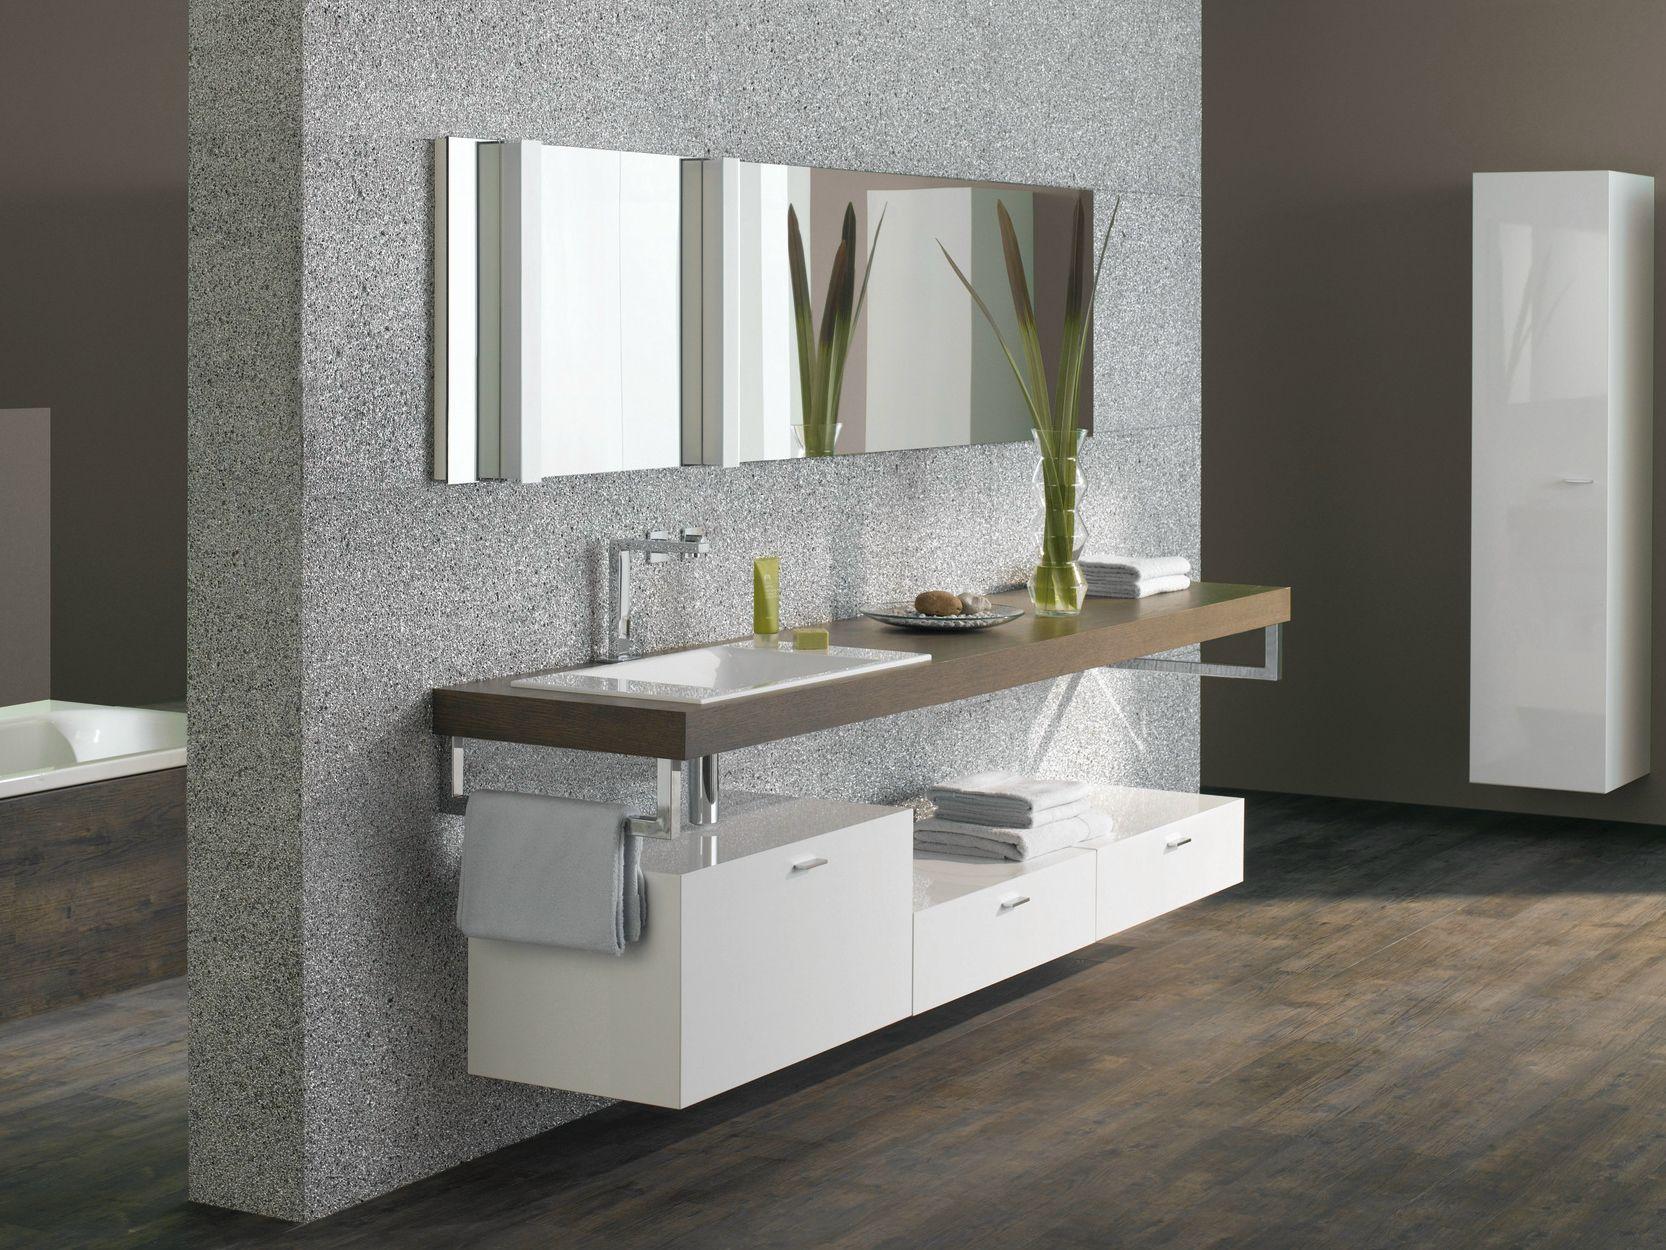 betteaqua einbauwaschbecken by bette design schmiddem design. Black Bedroom Furniture Sets. Home Design Ideas